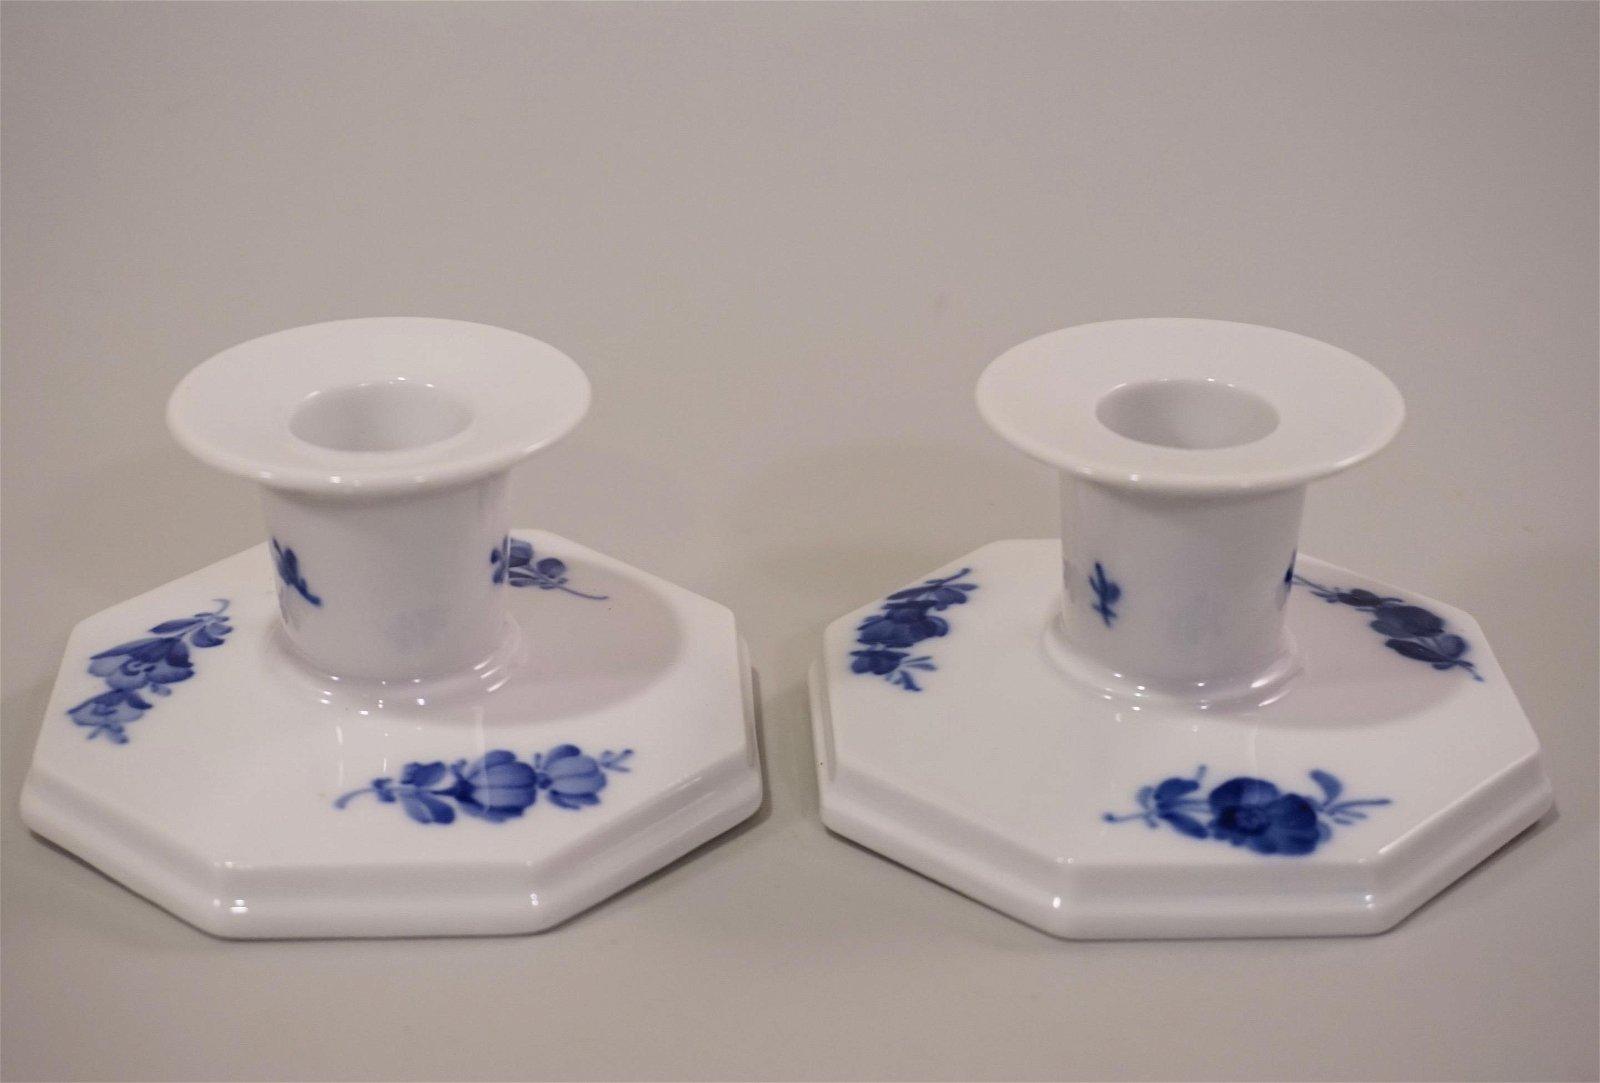 Denmark Porcelain Candle Holder Royal Copenhagen Blue